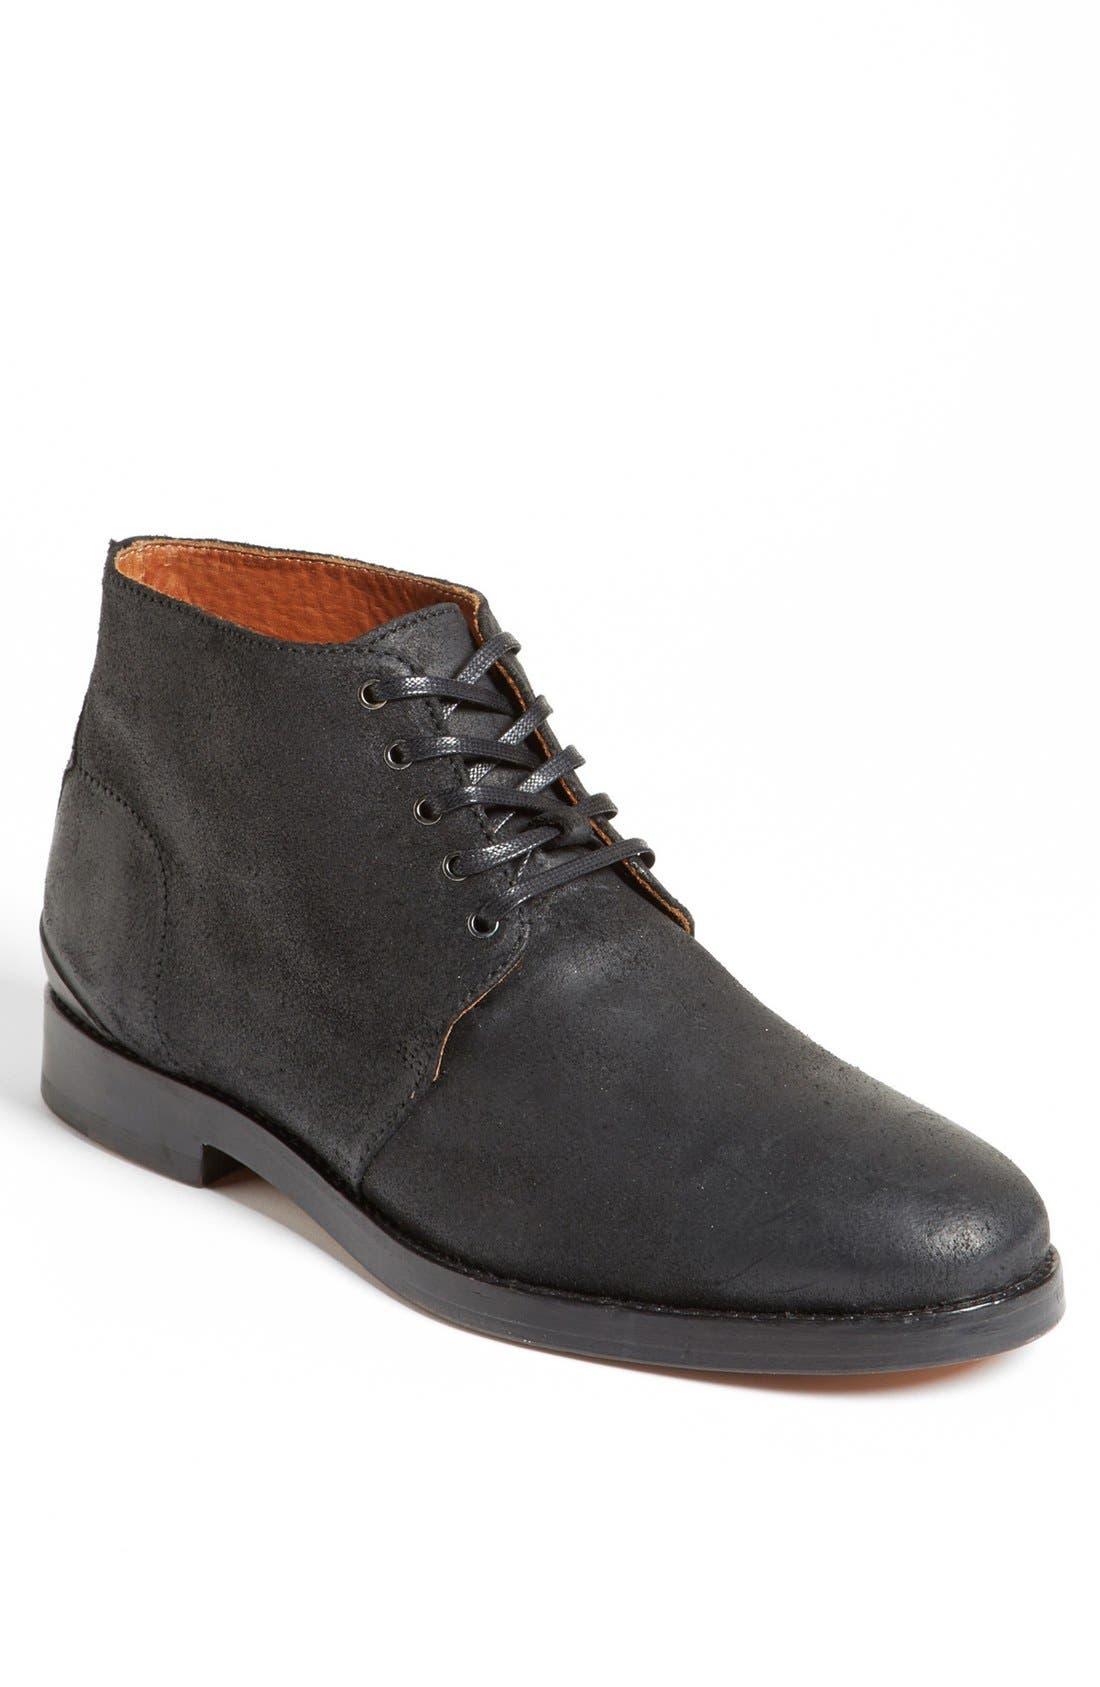 Alternate Image 1 Selected - rag & bone 'Archer' Plain Toe Suede Boot